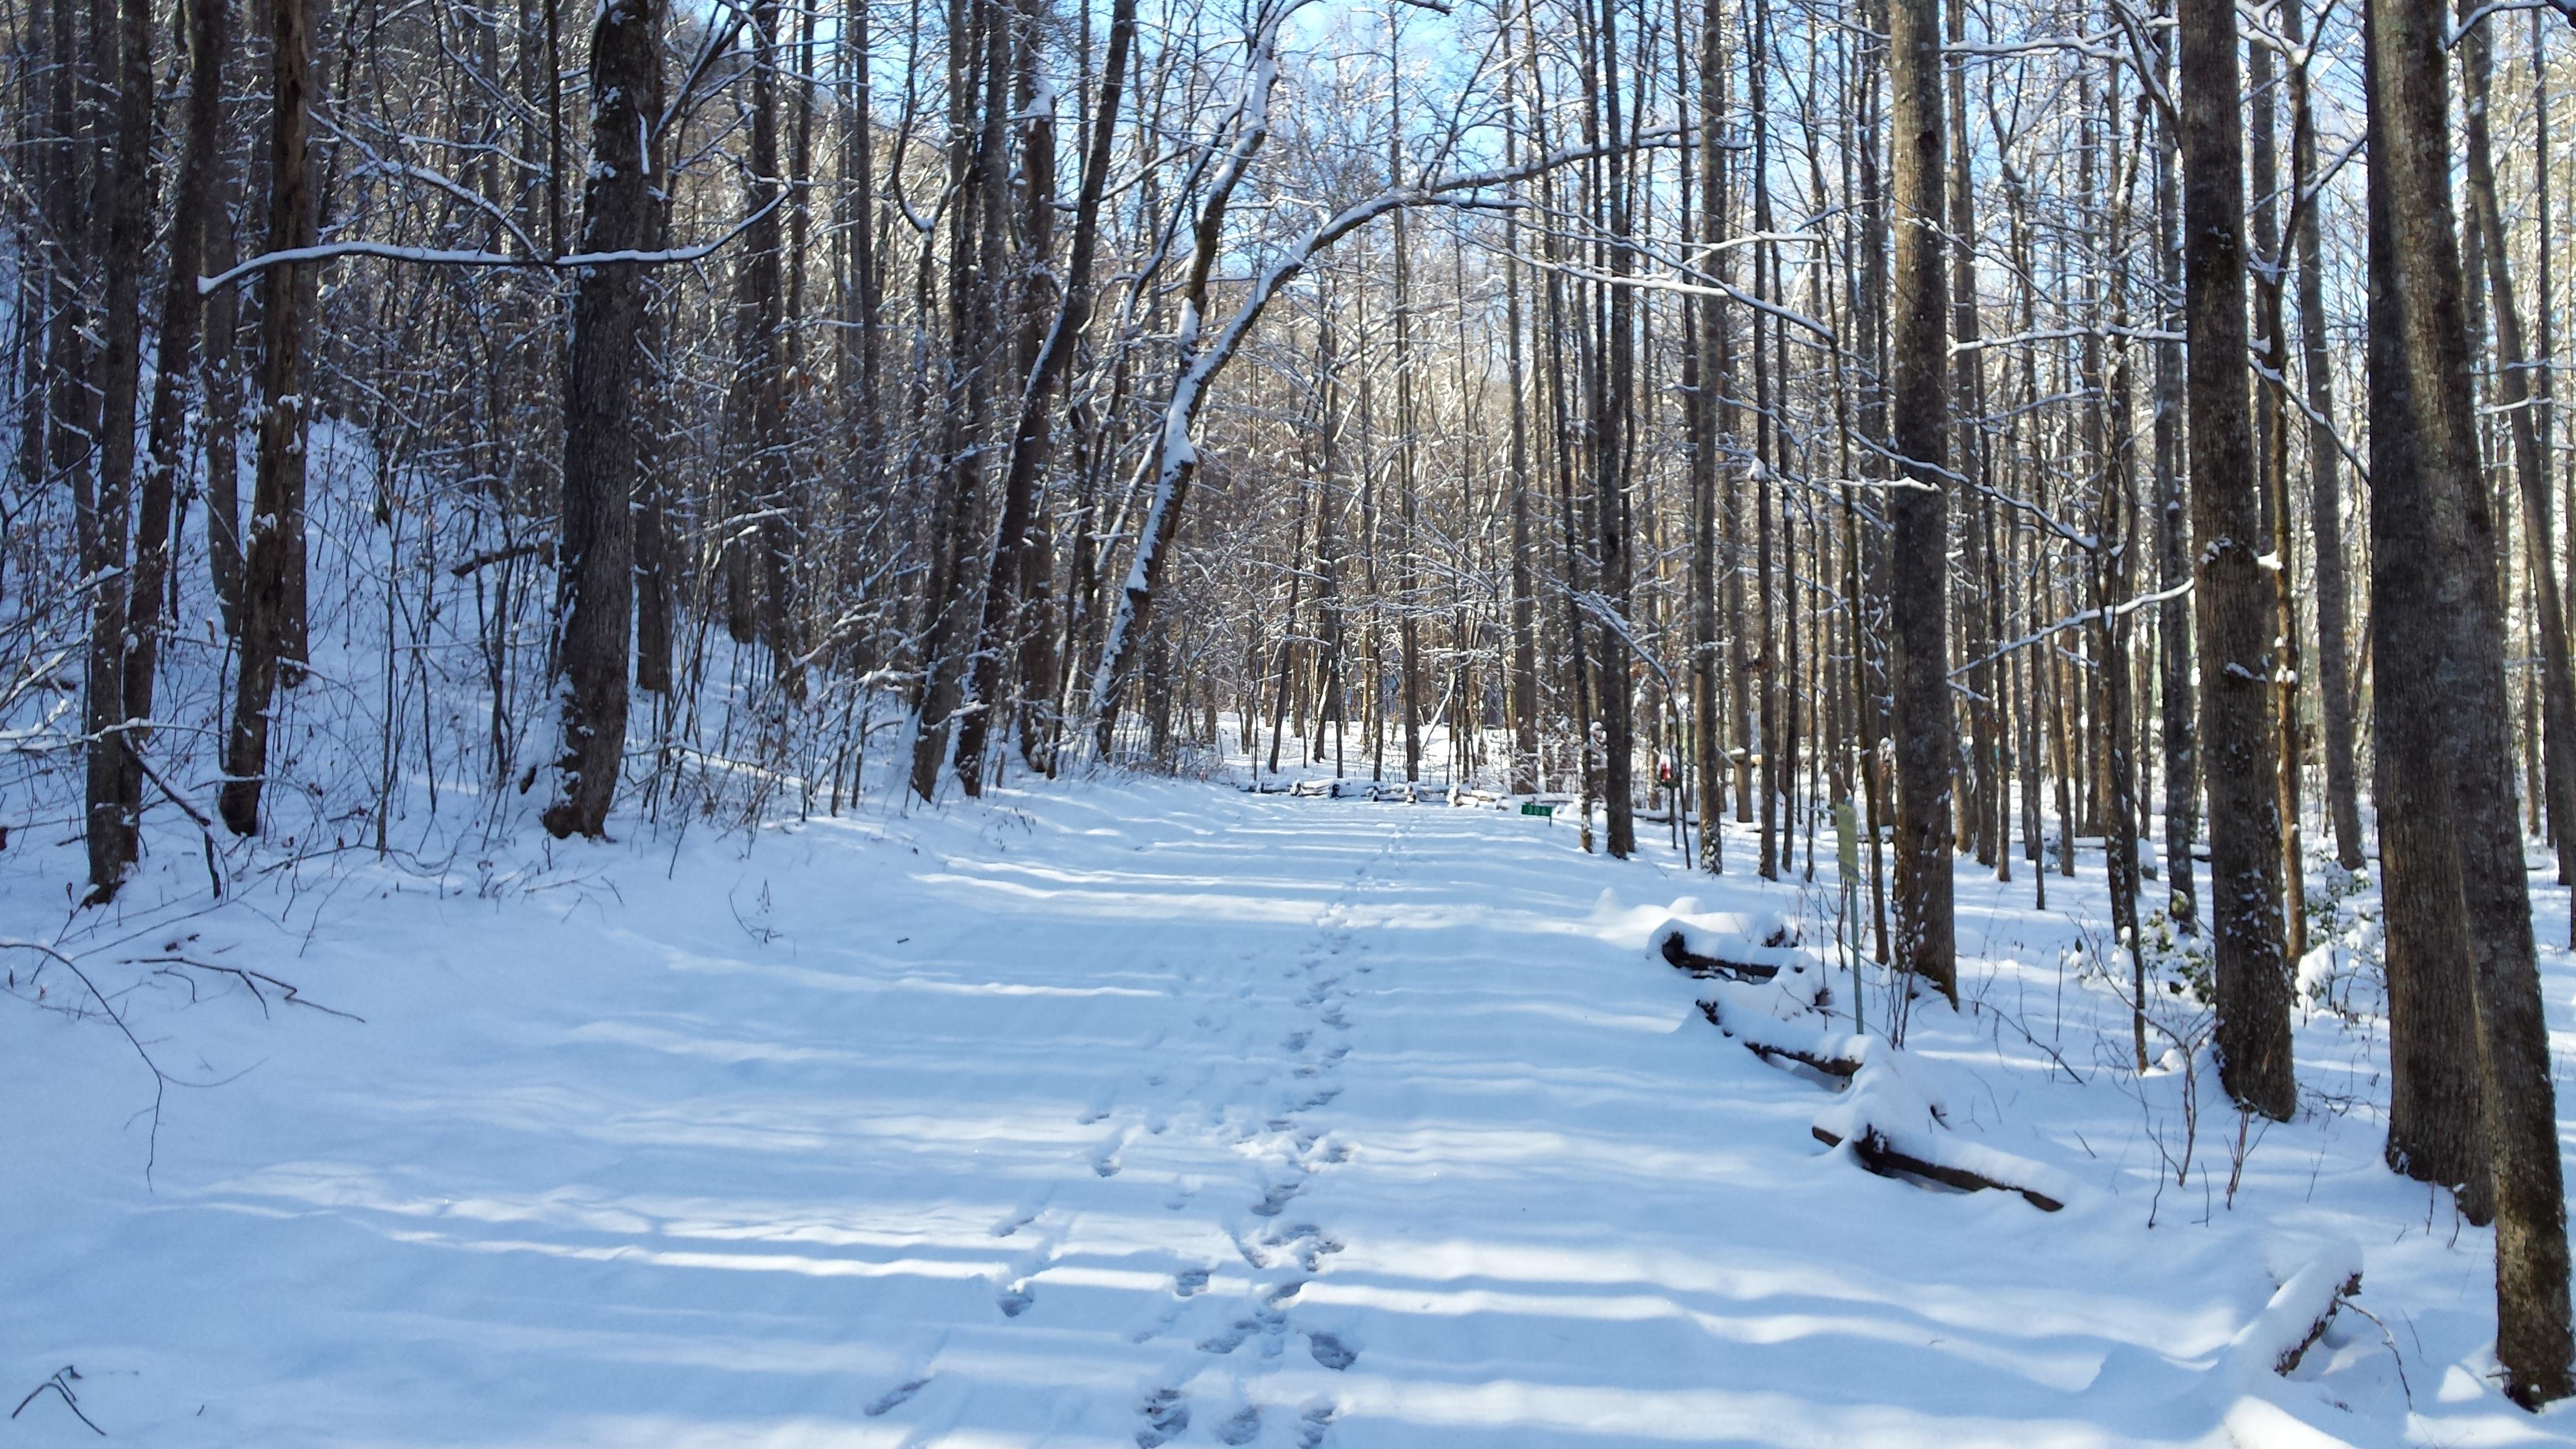 snow on serenity lane